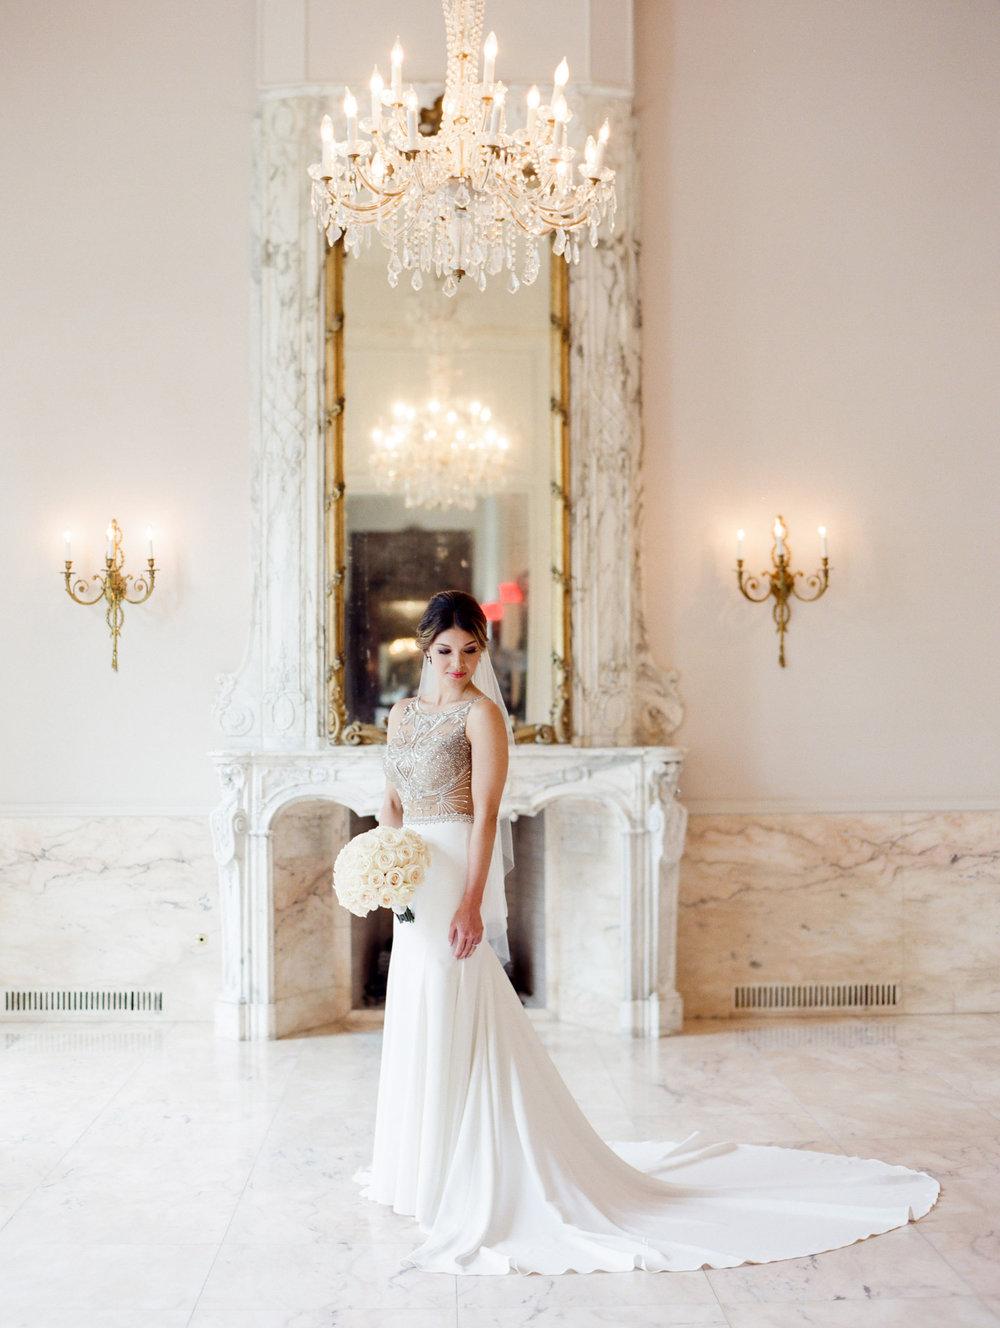 0027_0026_Houston-Chateau-Cocomar-Bridal-Photographer.jpg